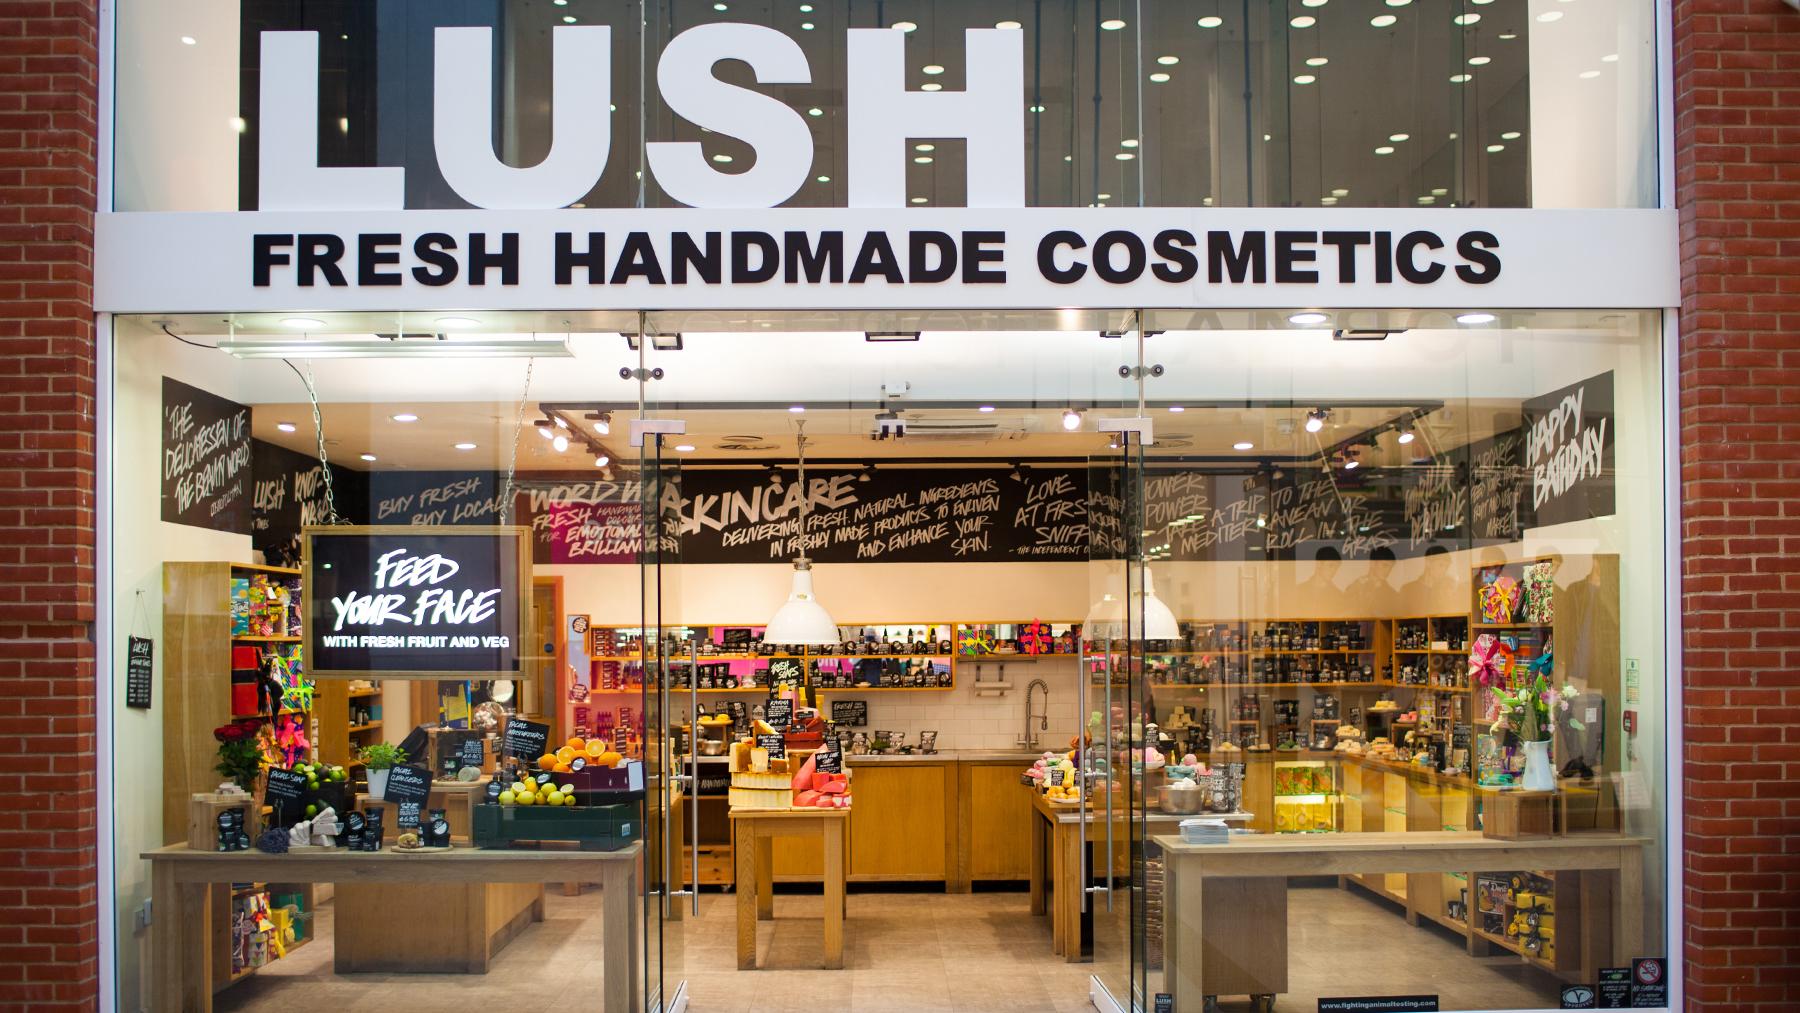 High Wycombe | Lush Fresh Handmade Cosmetics